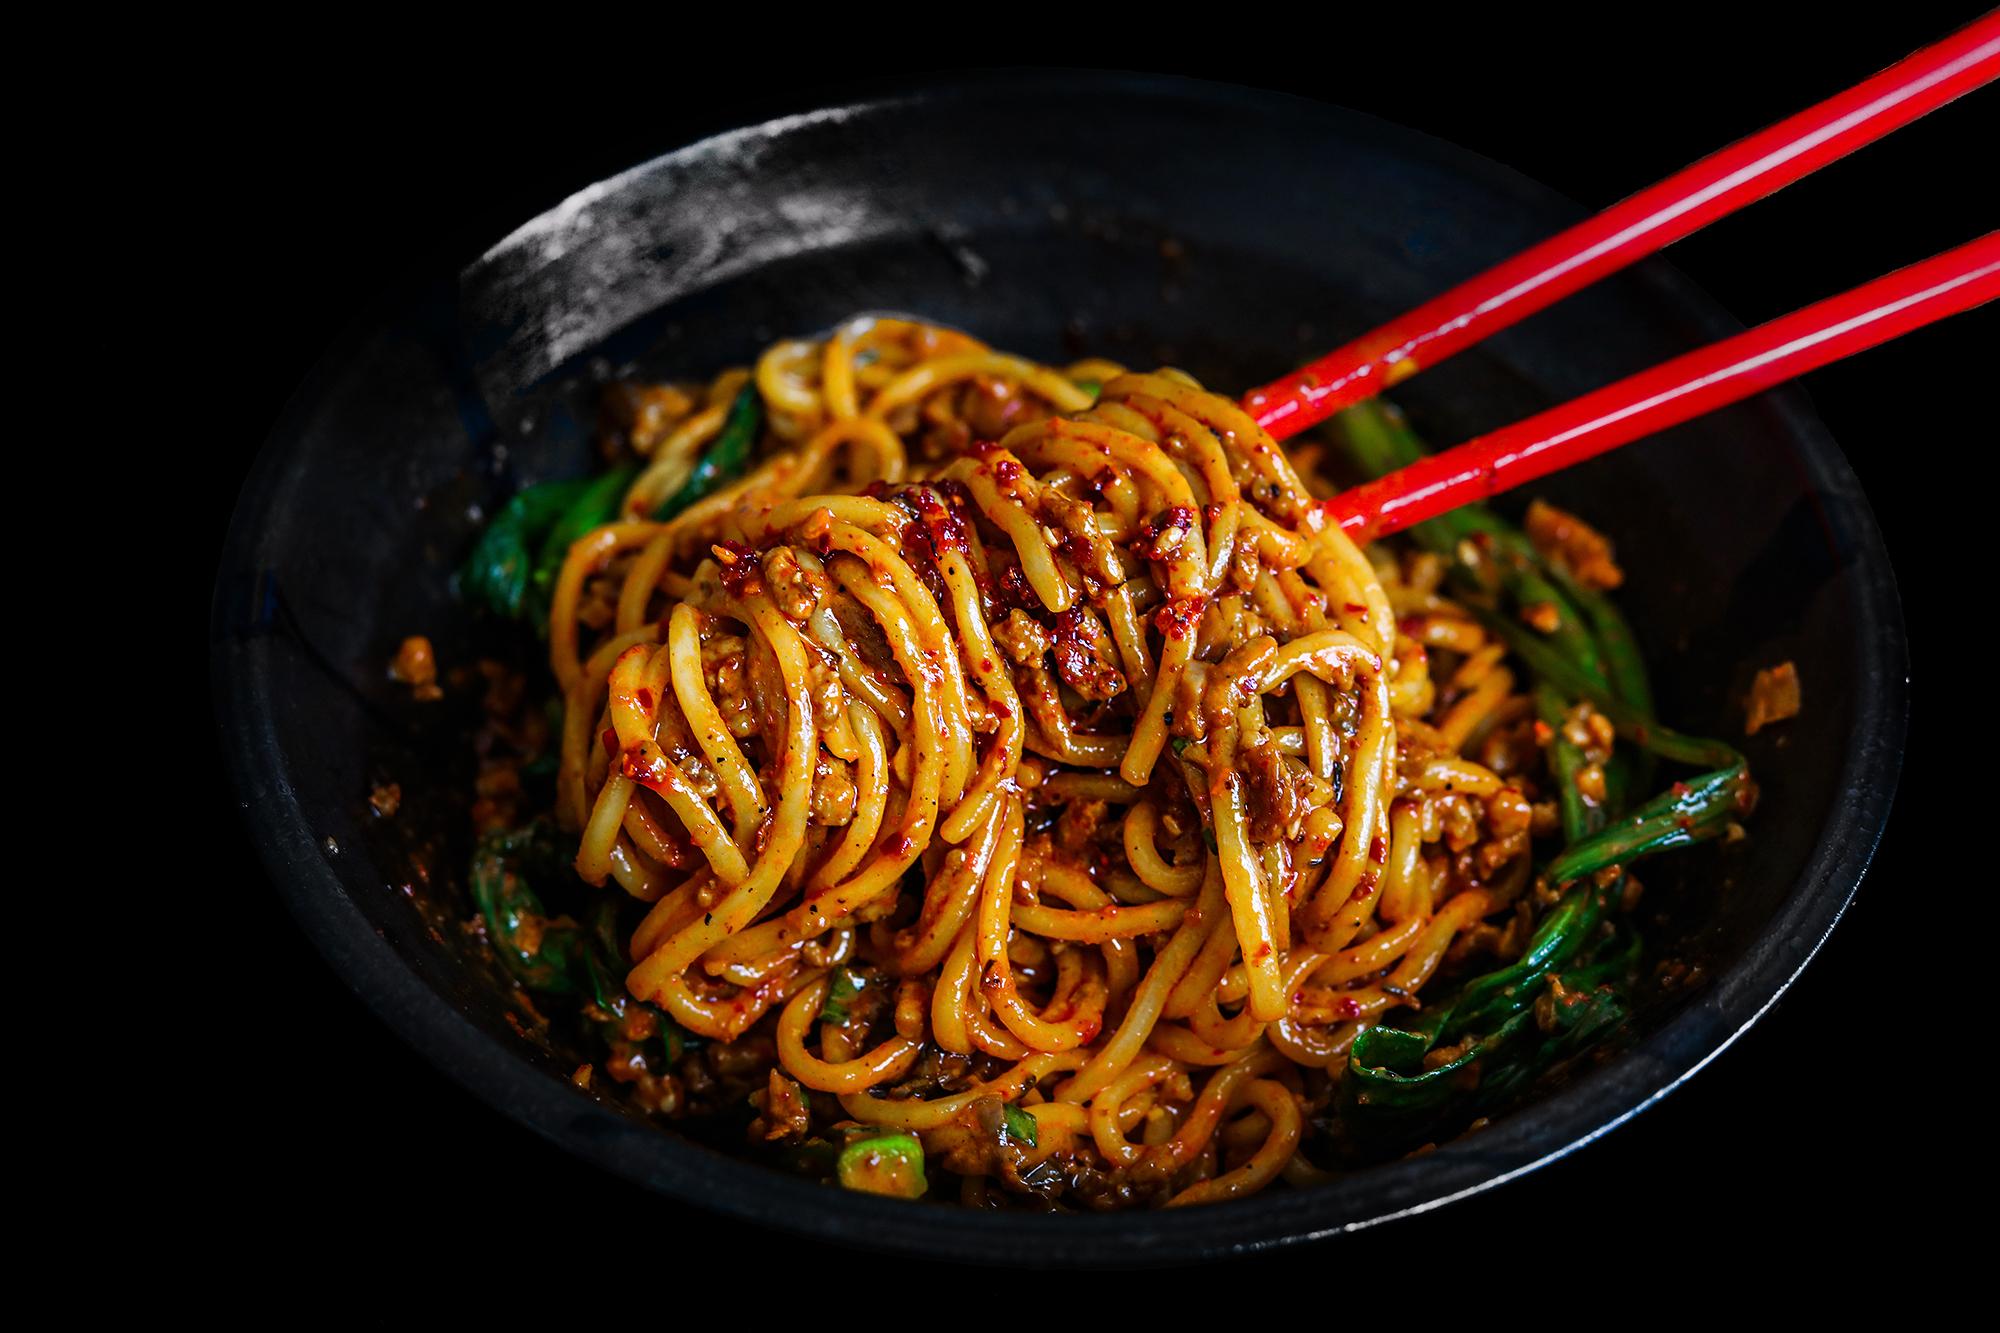 The Best Dan Dan Mian Dan Dan Noodles Recipe Video Seonkyoung Longest